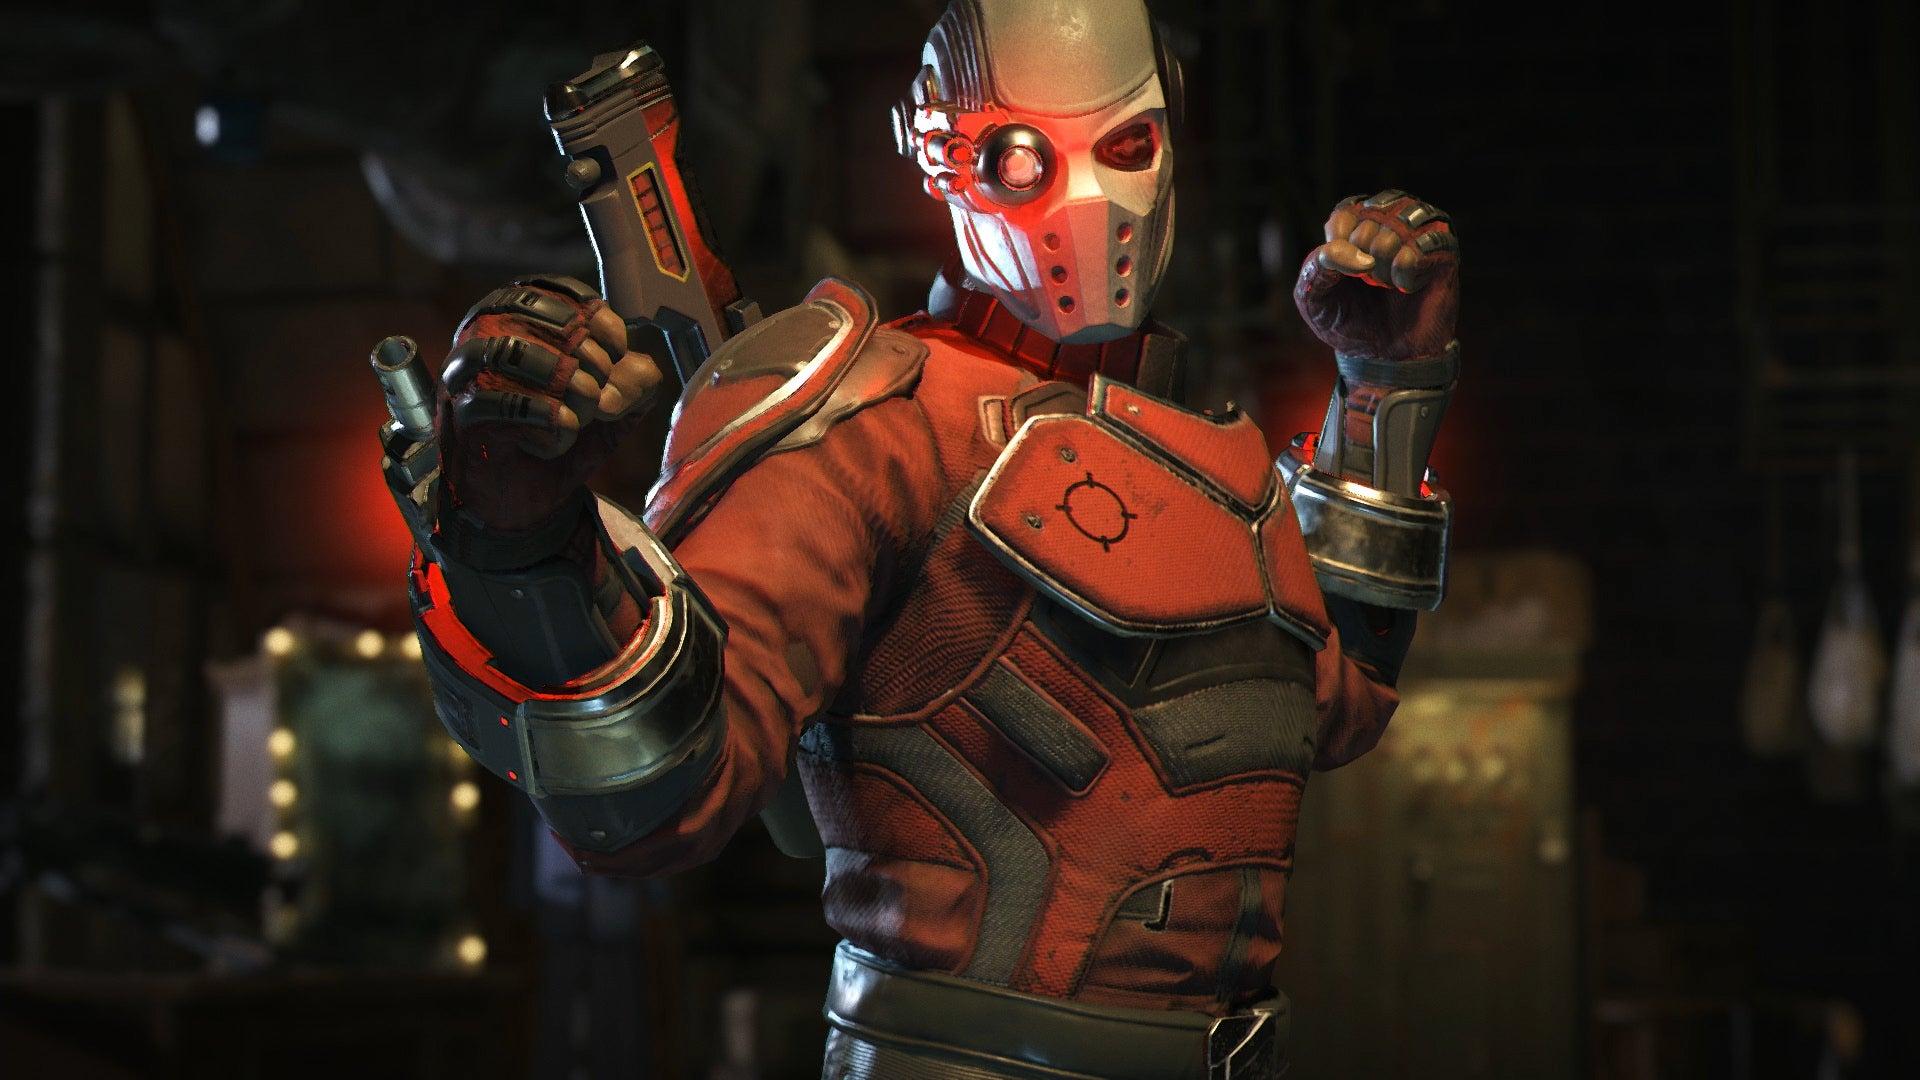 Deadshot Mask Injustice 2 - HD Wallpaper